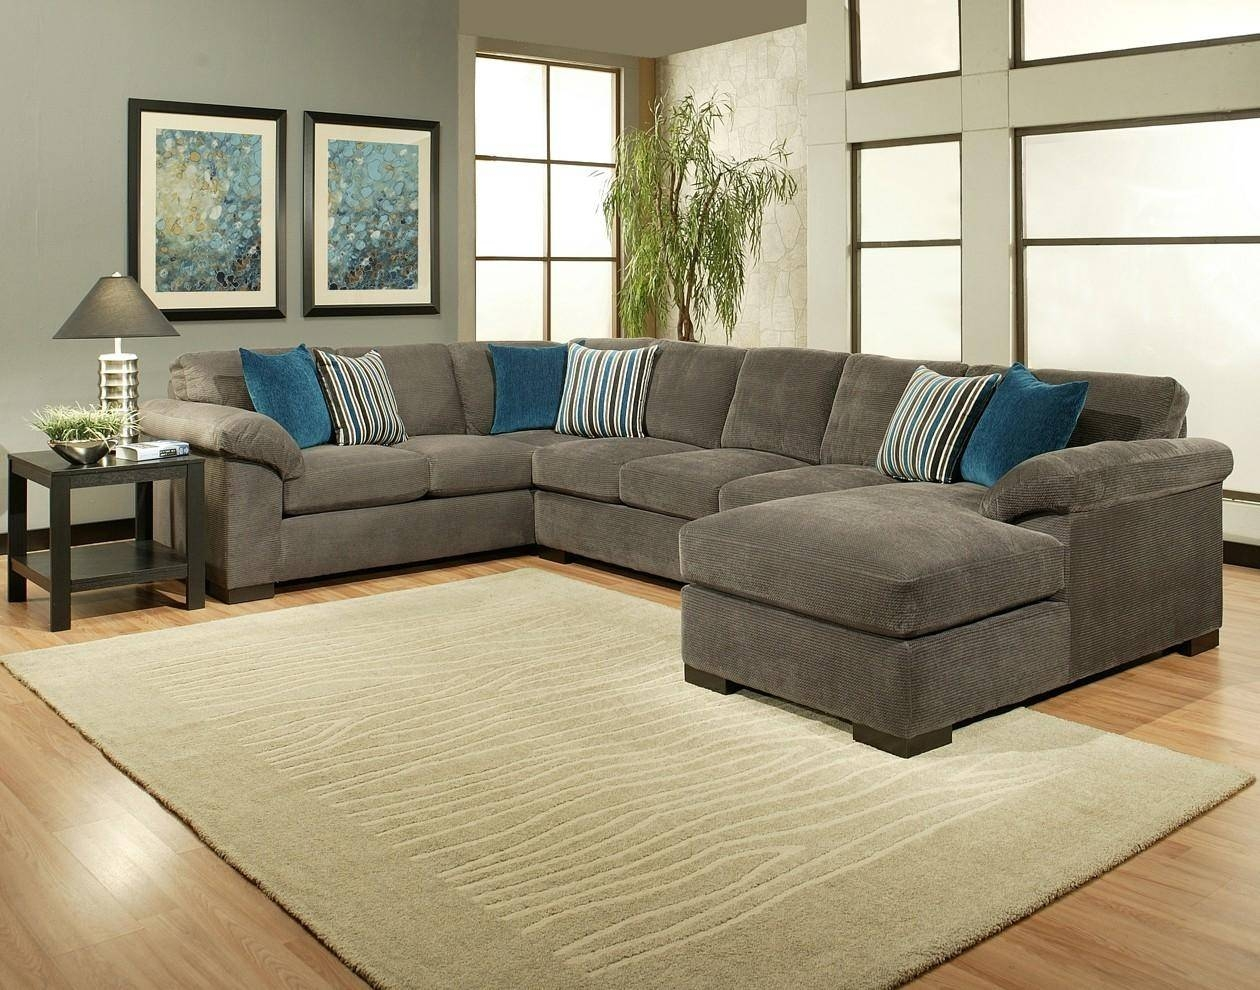 20 Inspirations Sealy Sofas | Sofa Ideas within Sealy Sofas (Image 10 of 15)